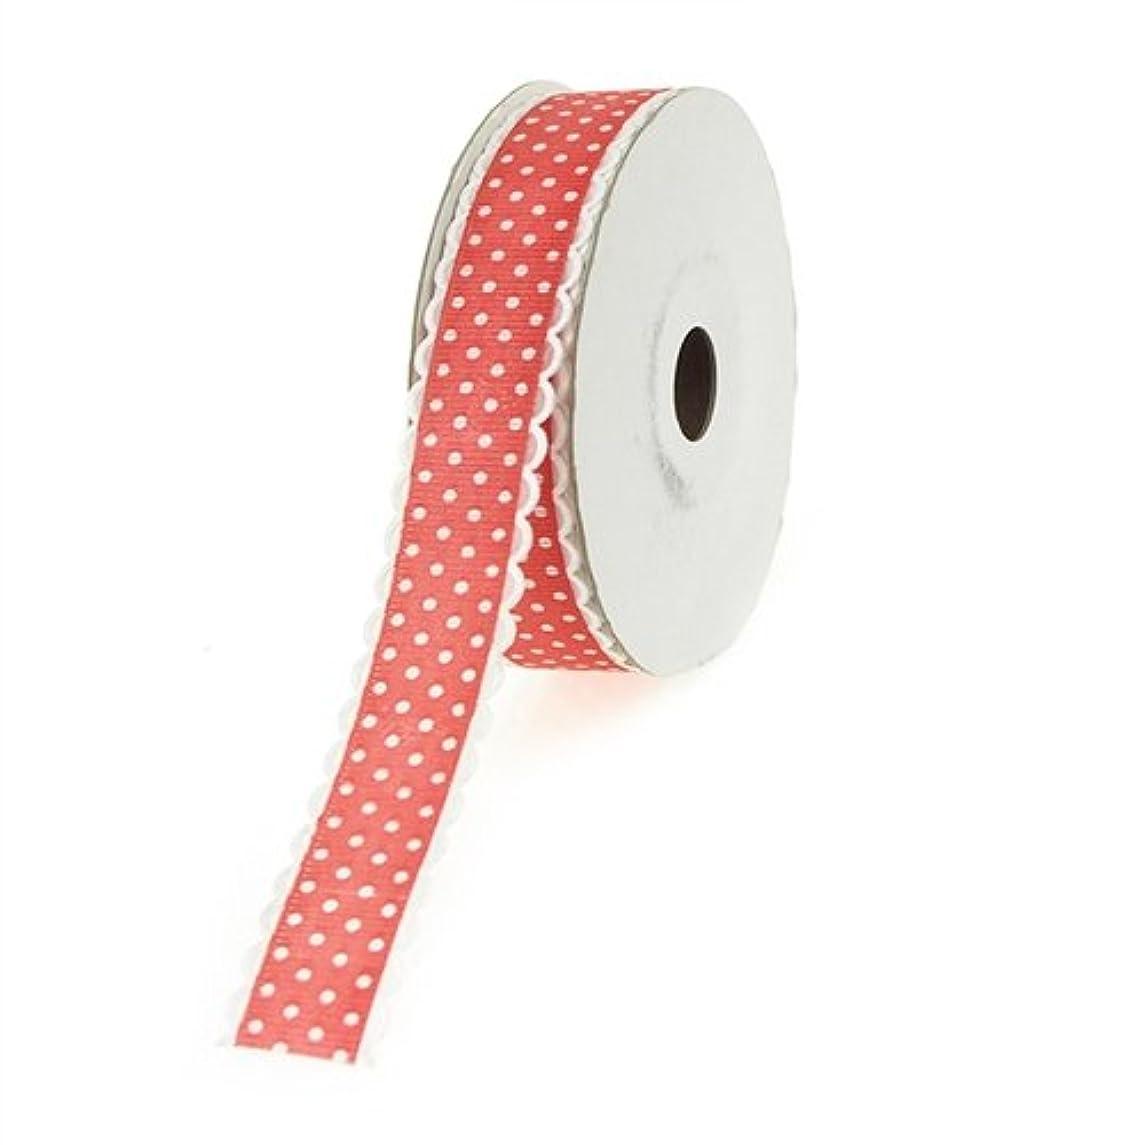 Homeford Firefly Imports Polka-Dot Polyester Ribbon Scalloped-Edge, 7/8-Inch, 25 Yards, Hot Pink 7/8